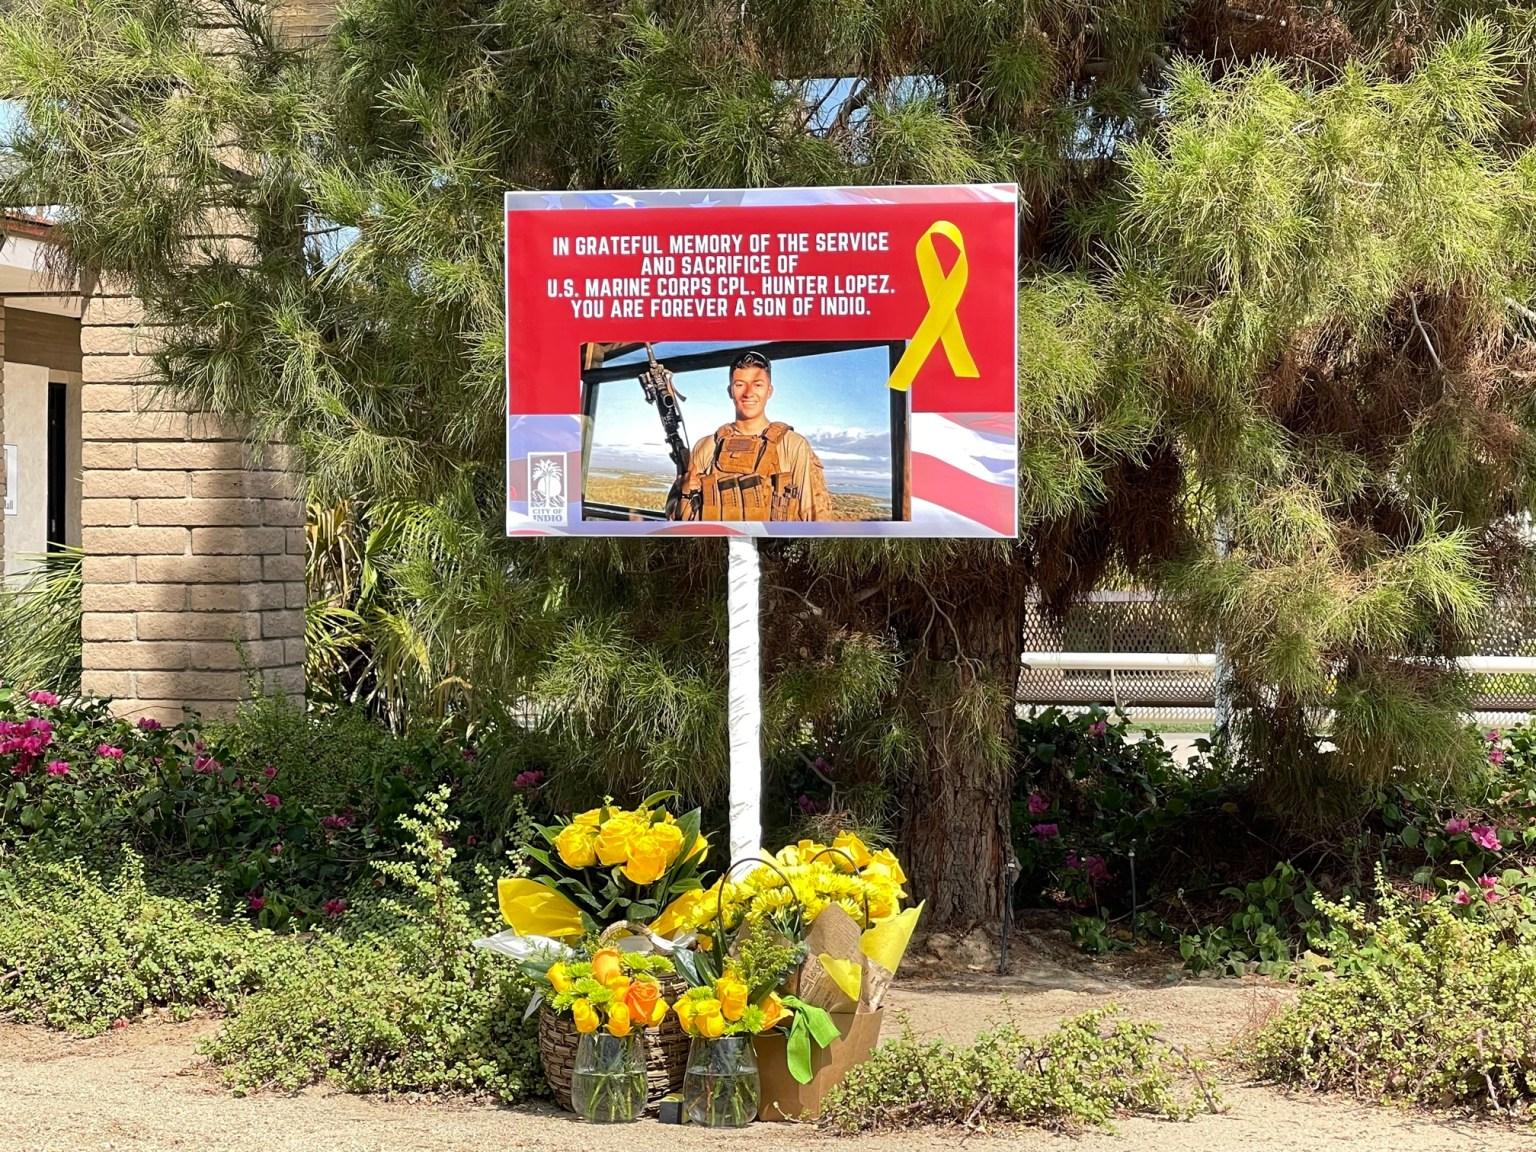 memorial honoring U.S. Marine Corps Cpl. Hunter Lopez